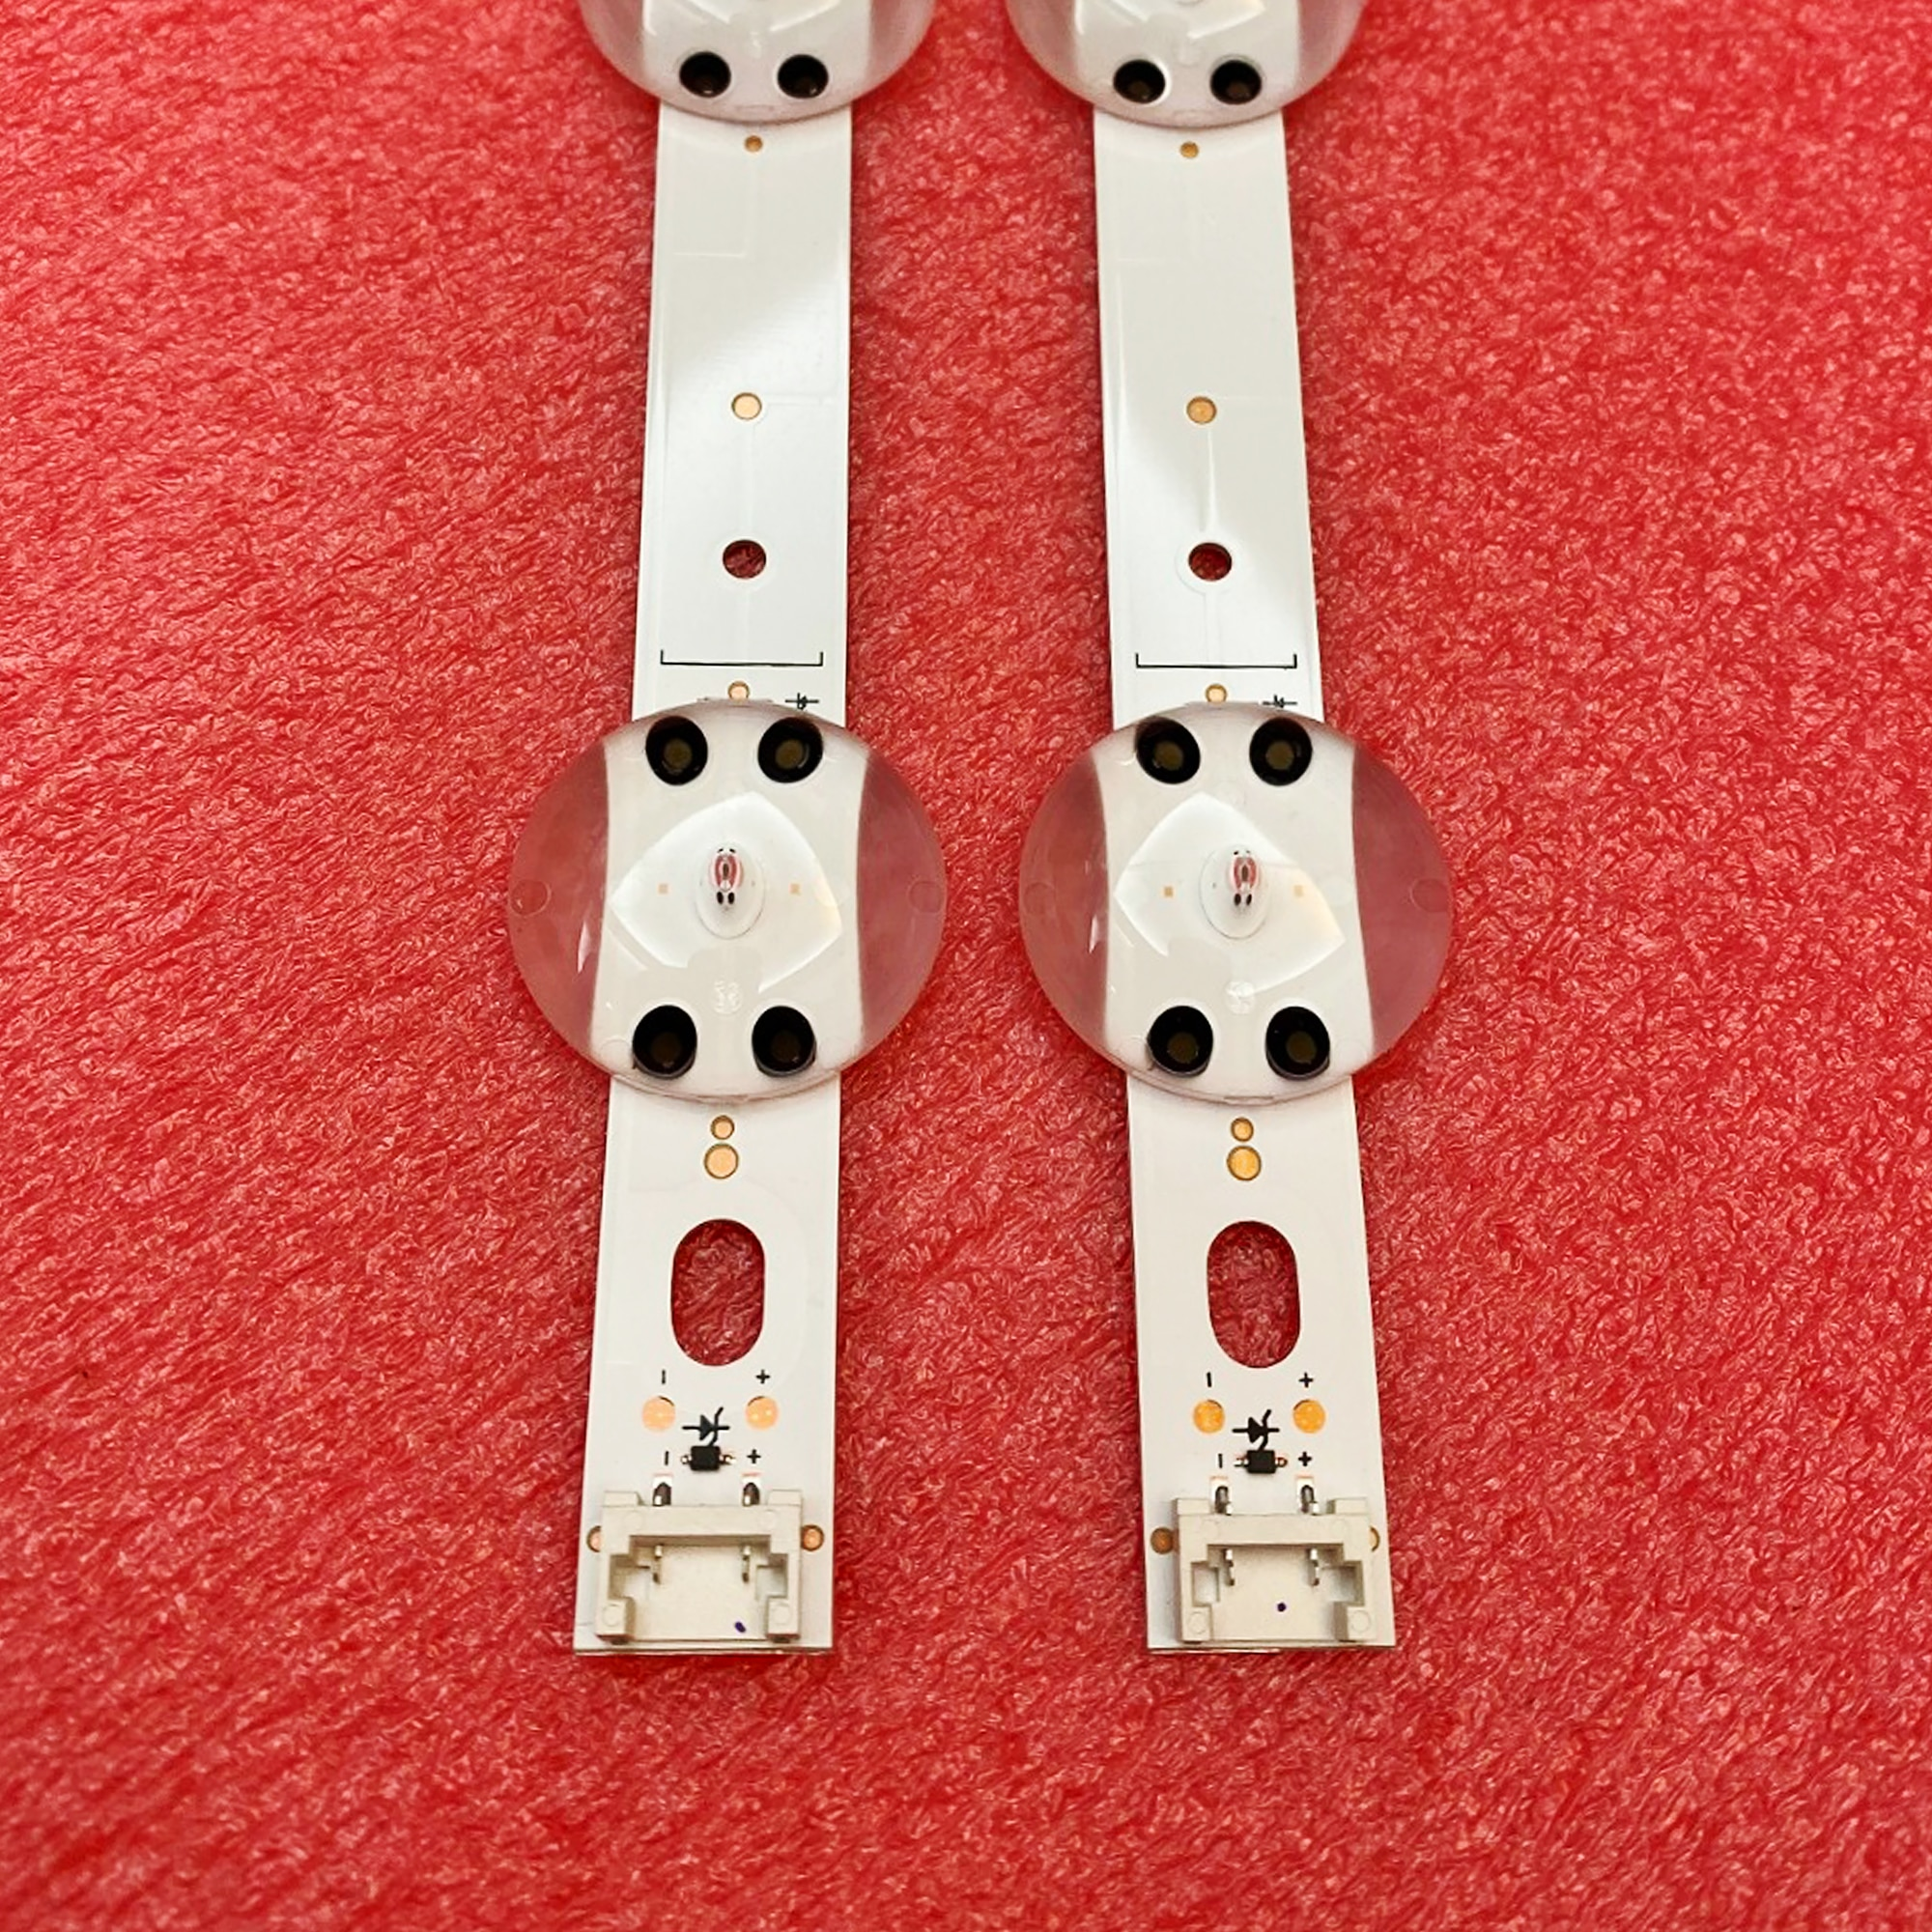 660 milímetros tira conduzida luz de fundo para LG 32LJ610V 32LJ510V 32LJ510U HC320DXN-ABSL1-2143 LC320DXE (FK)(A2) 6916L-2855B 32 V17 ART3 2855